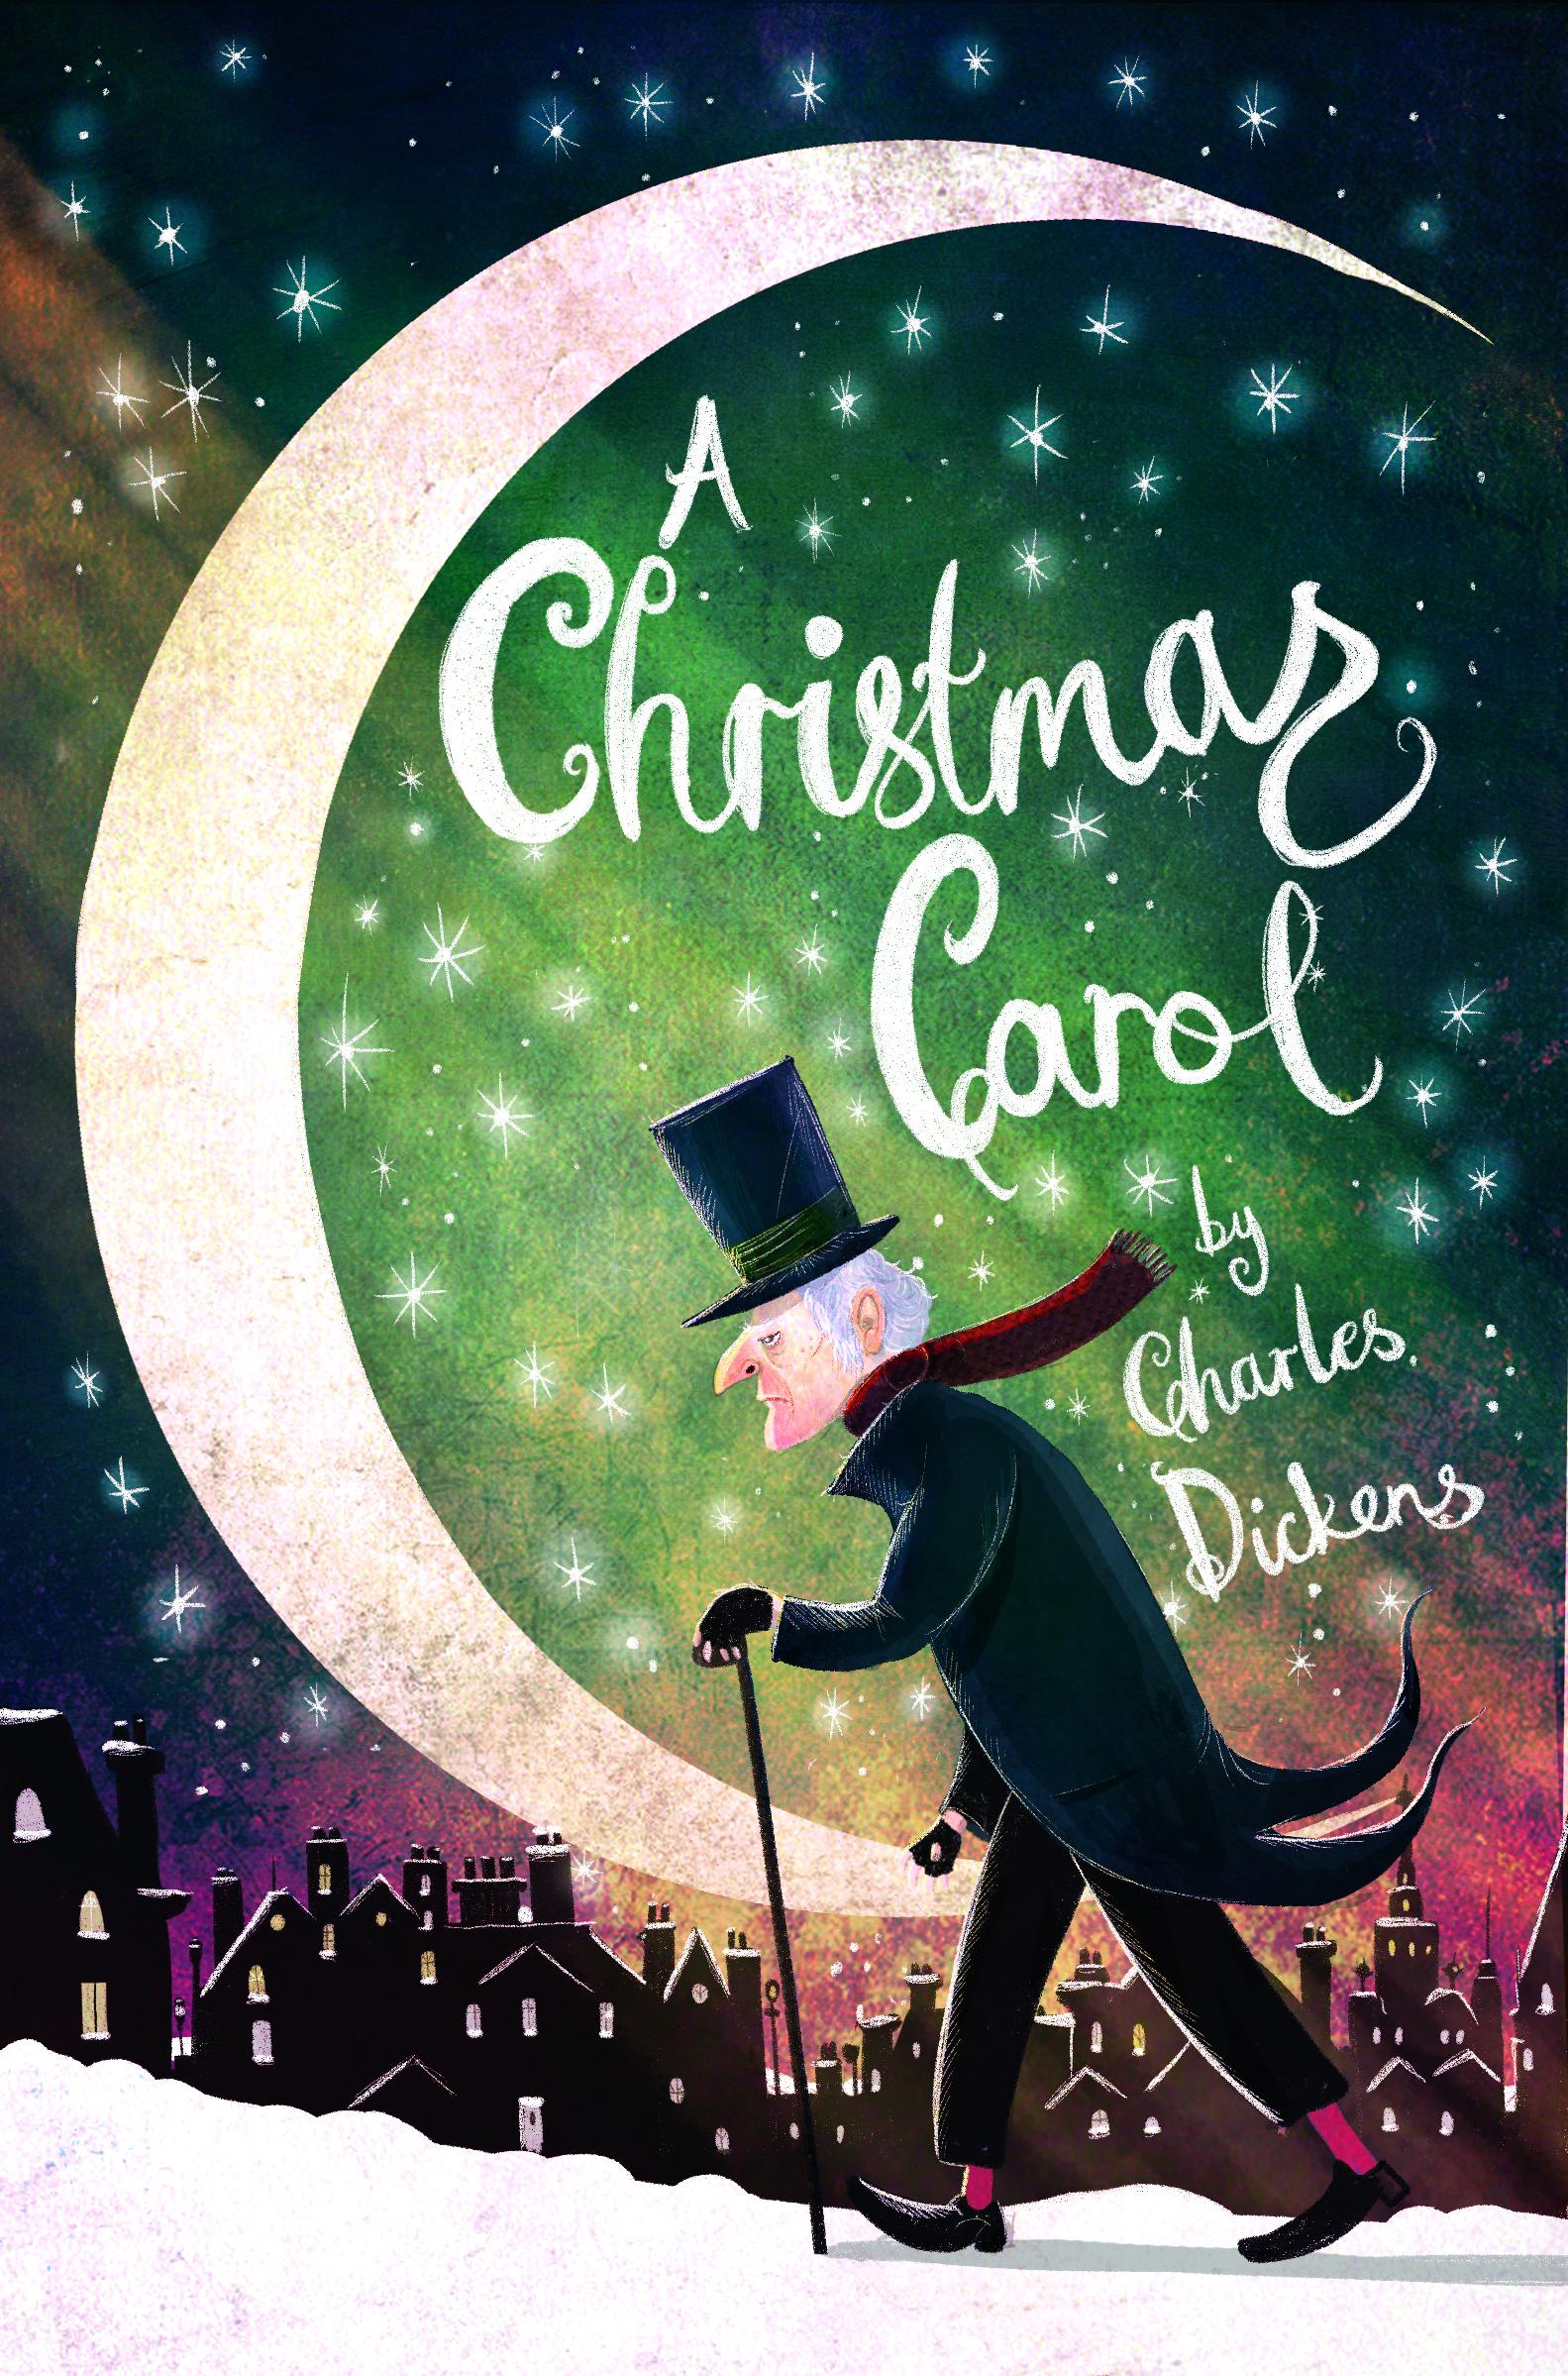 1. A Christmas Carol FRONT